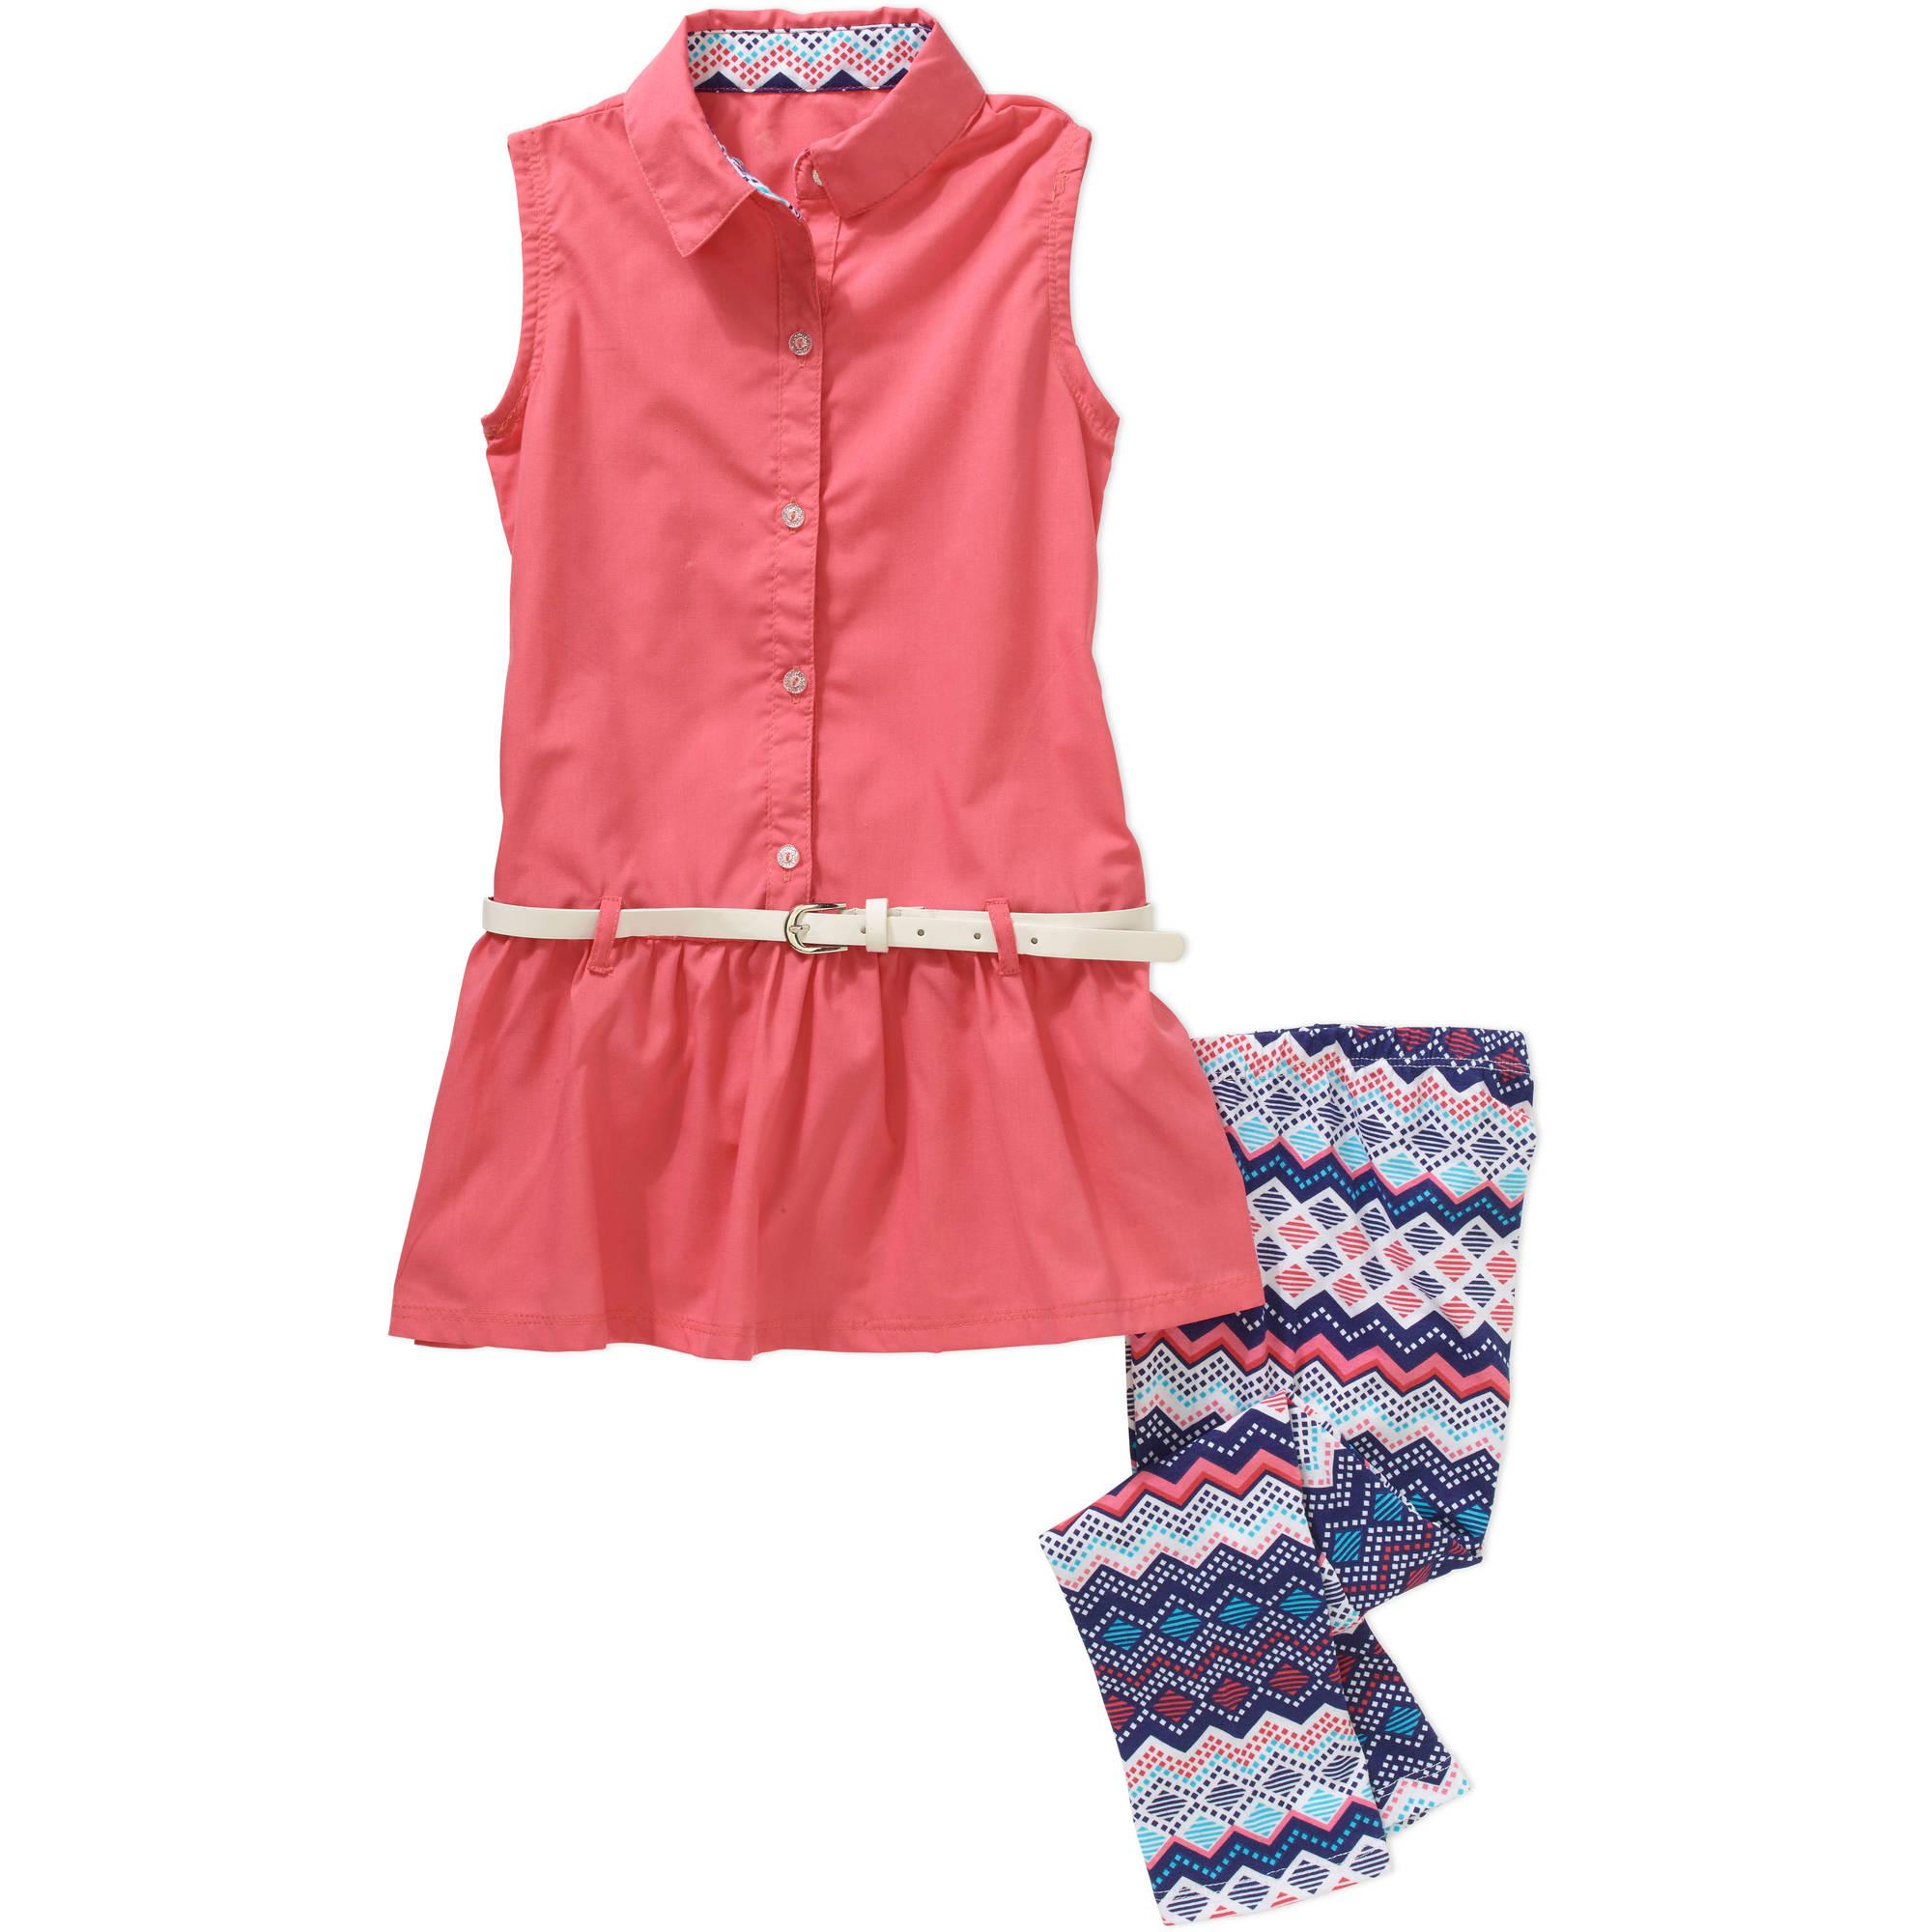 One Step Up Girls #SheSet Belted Sleeveless Chambray Top & Printed Legging Set